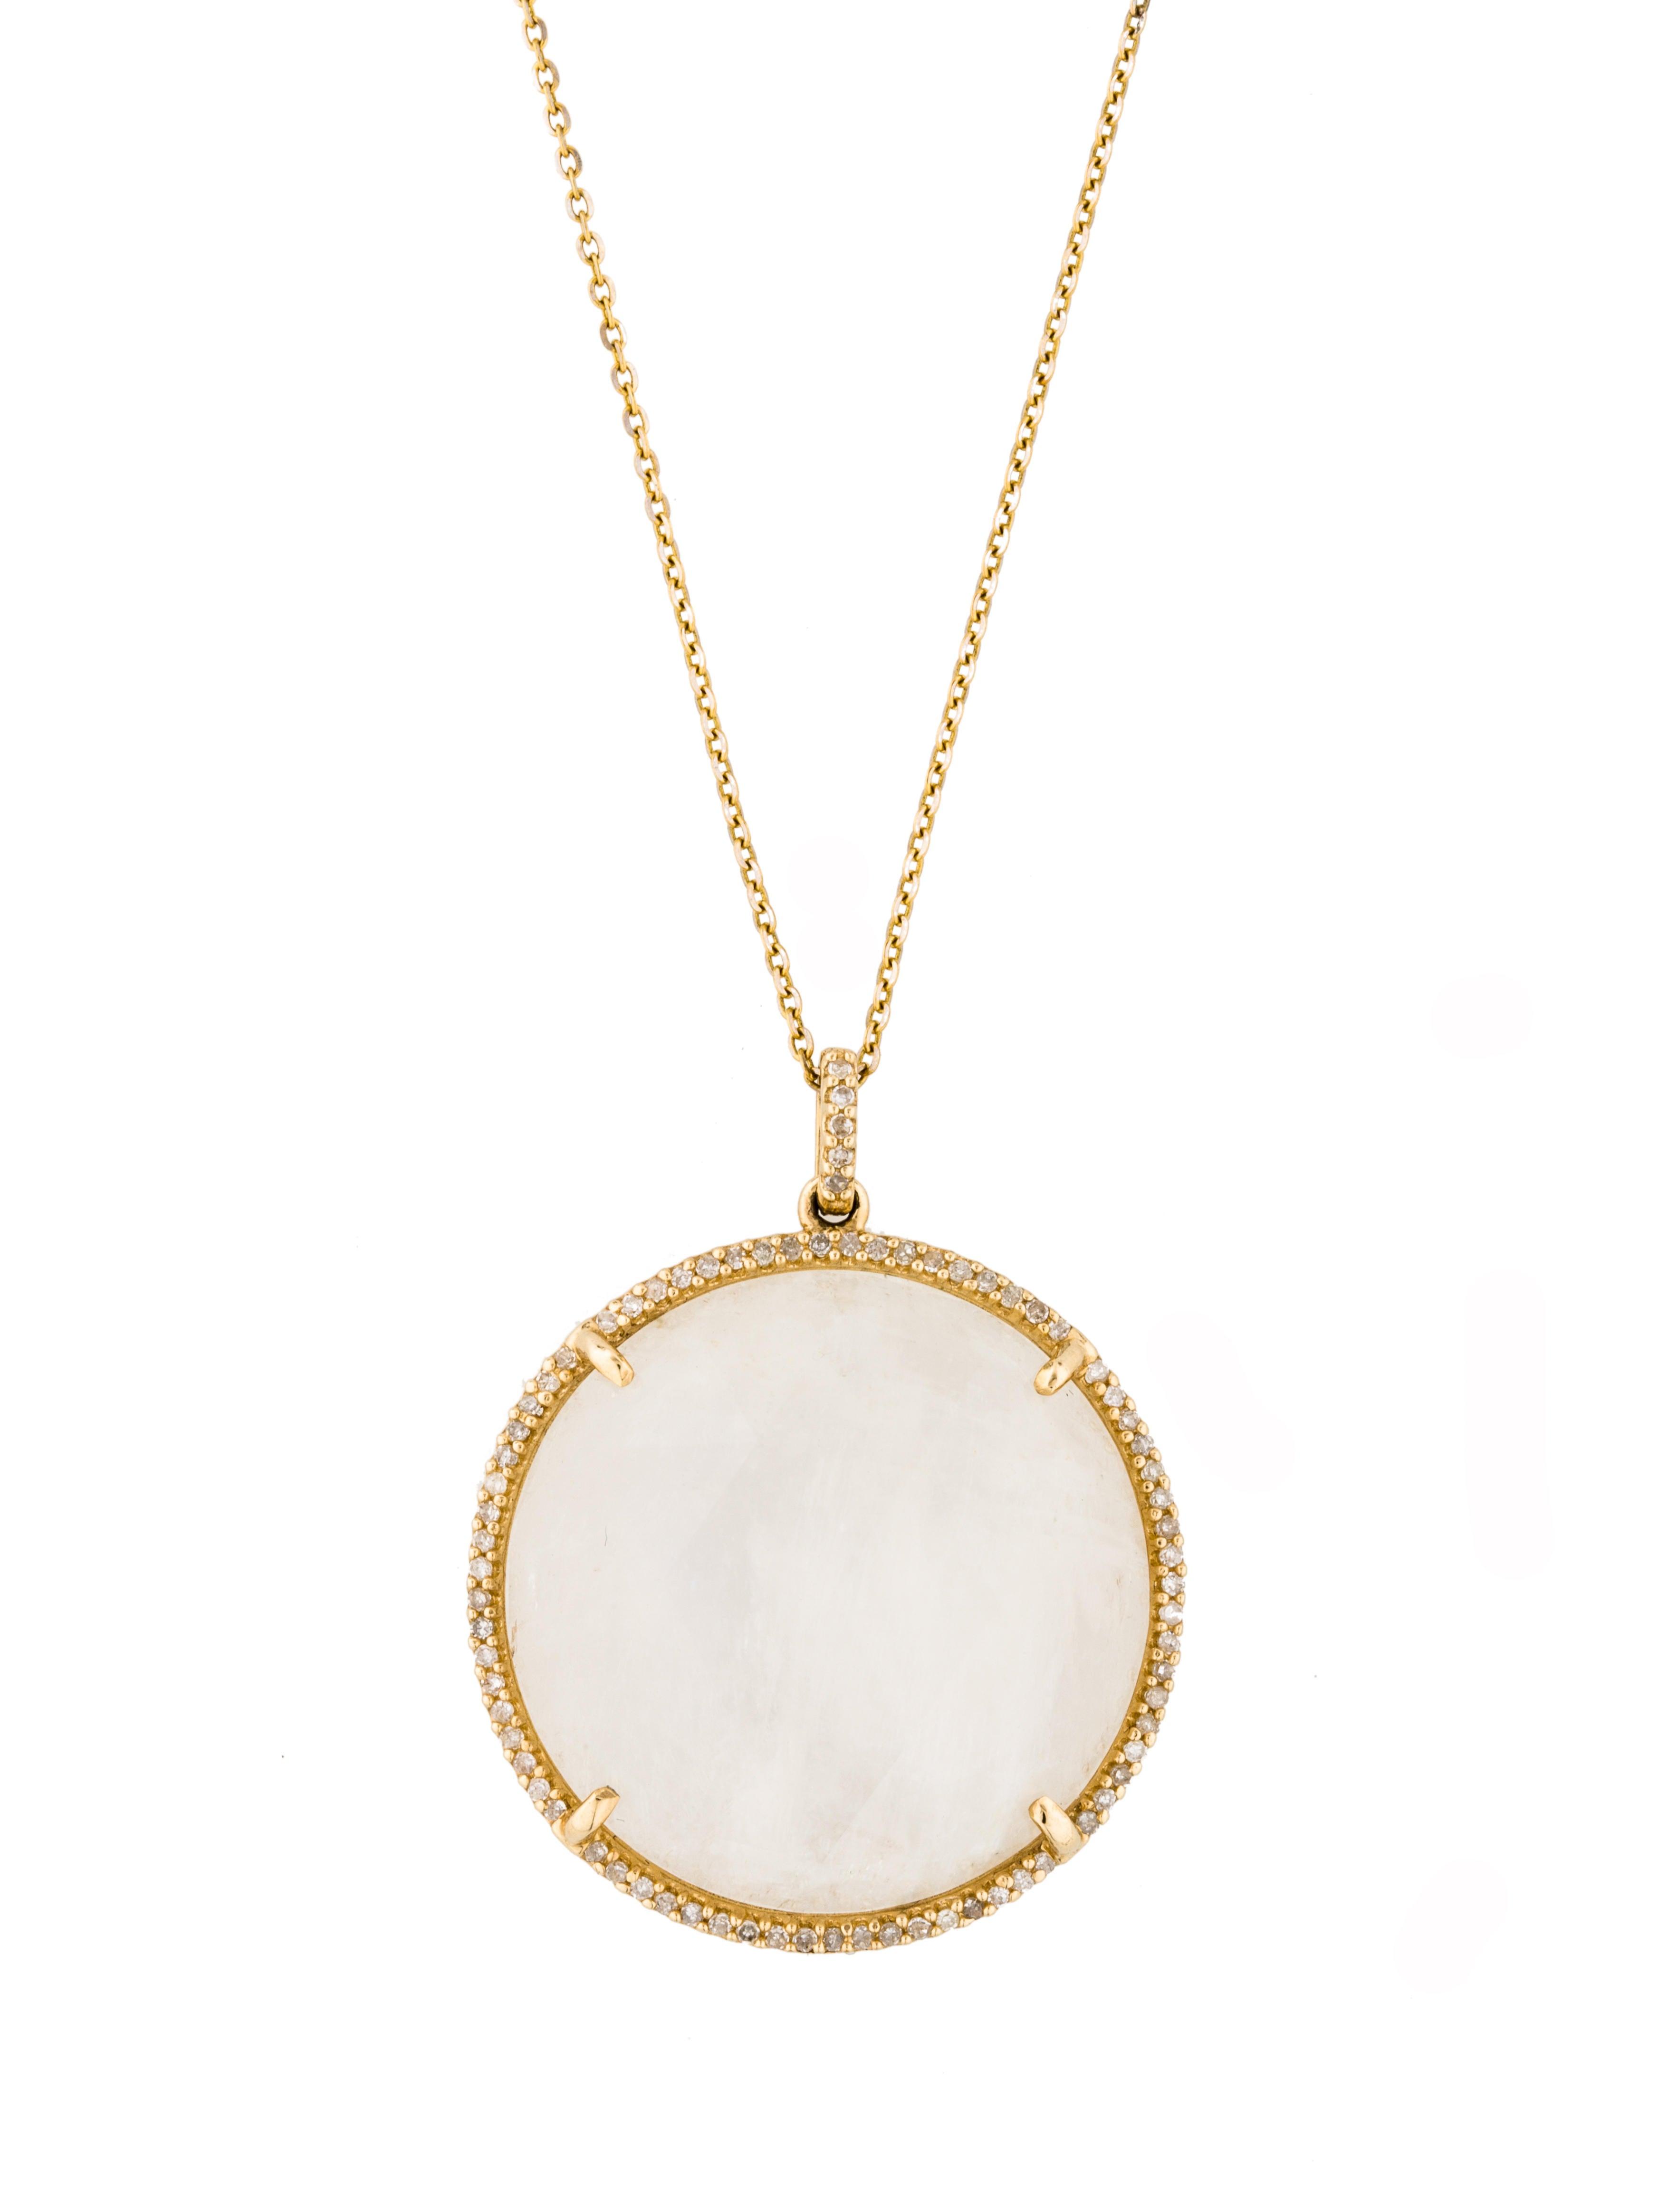 14K Diamond & Moonstone Pendant Necklace - Necklaces ...